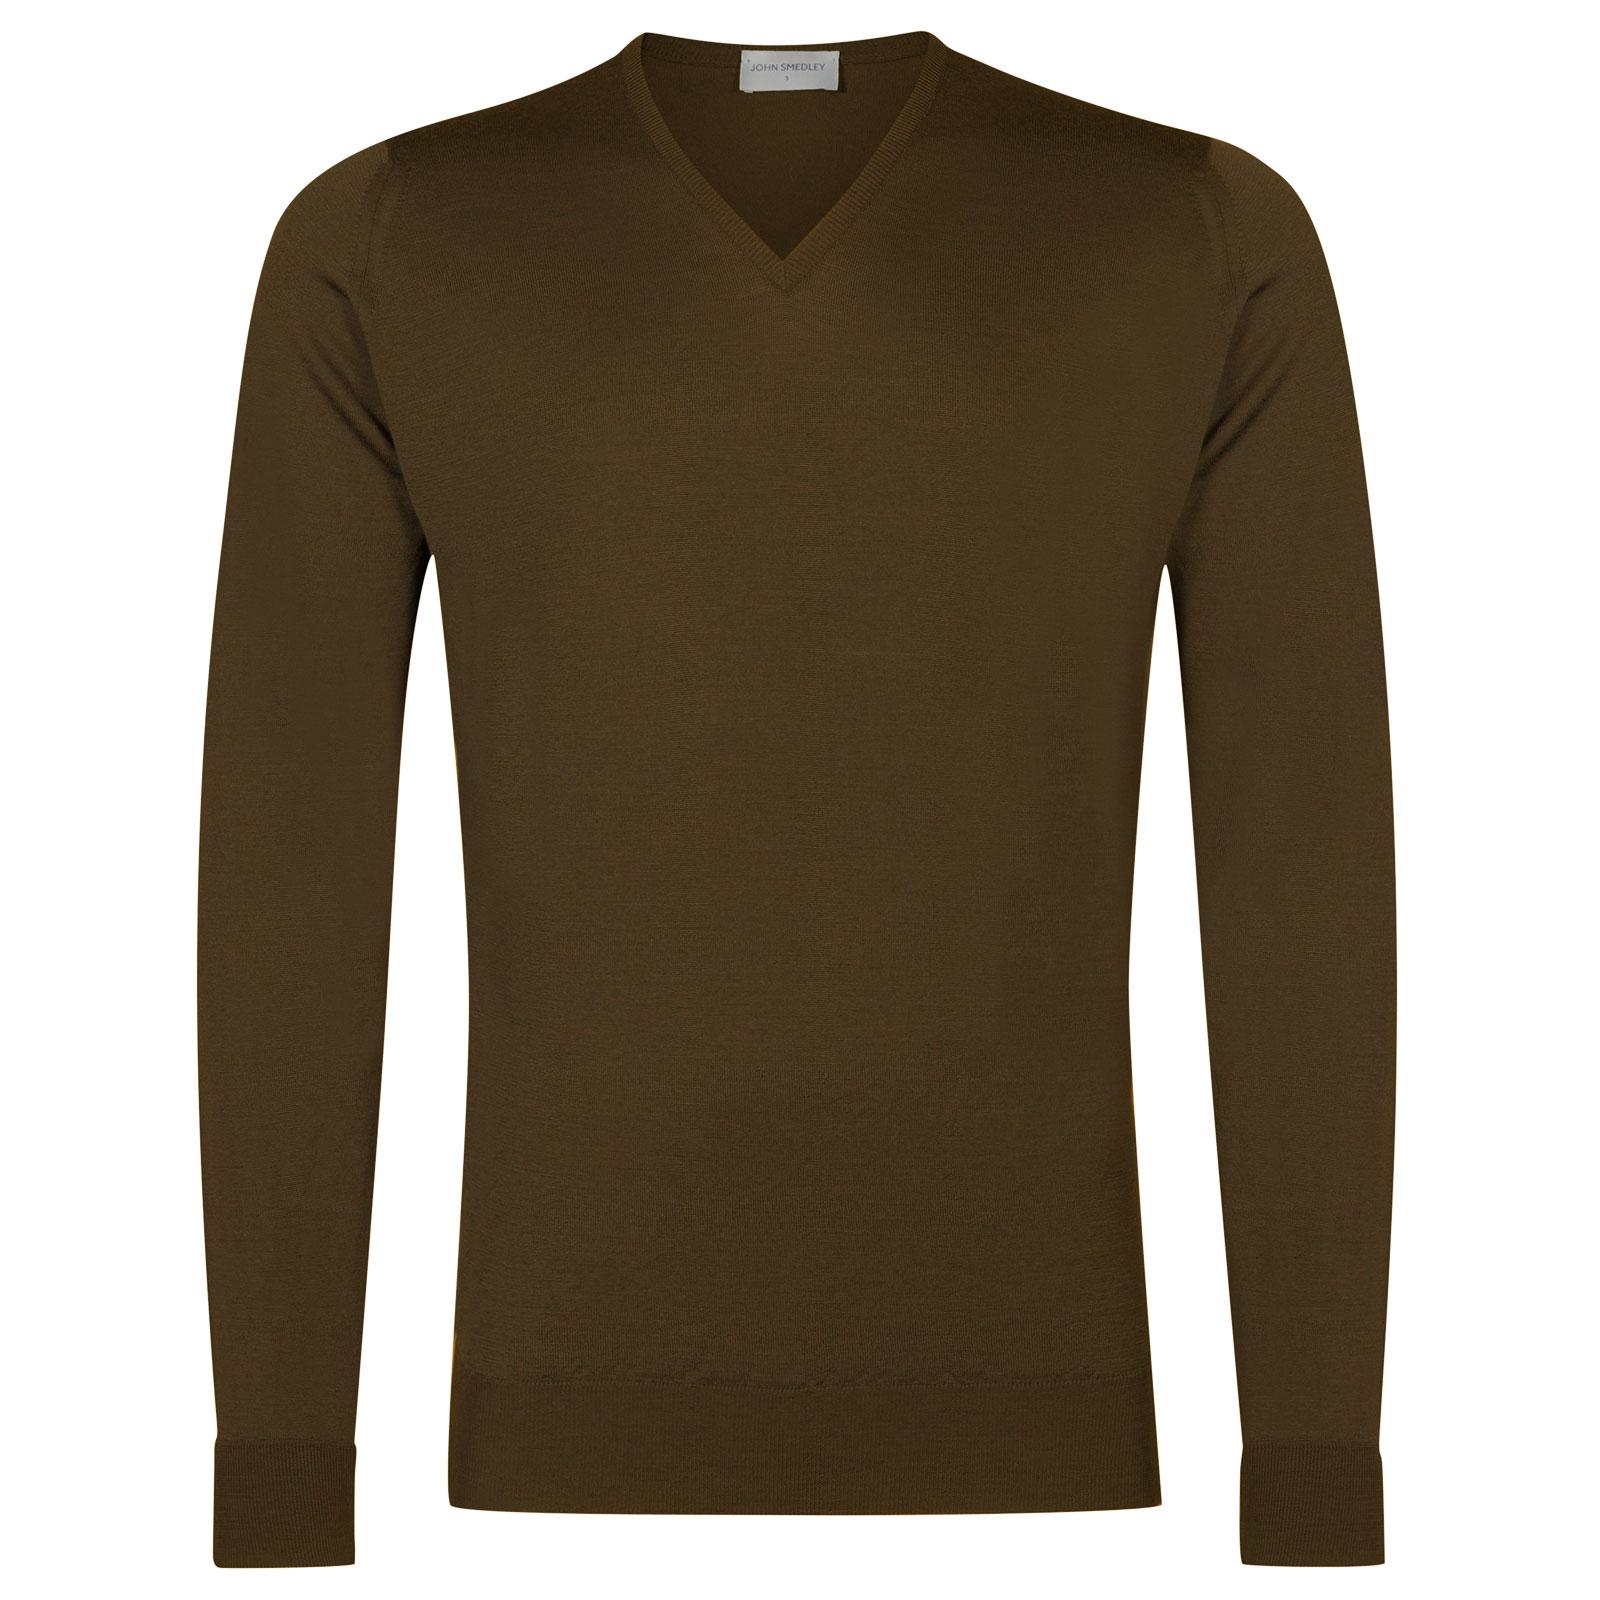 John Smedley bobby Merino Wool Pullover in Kielder Green-XXL